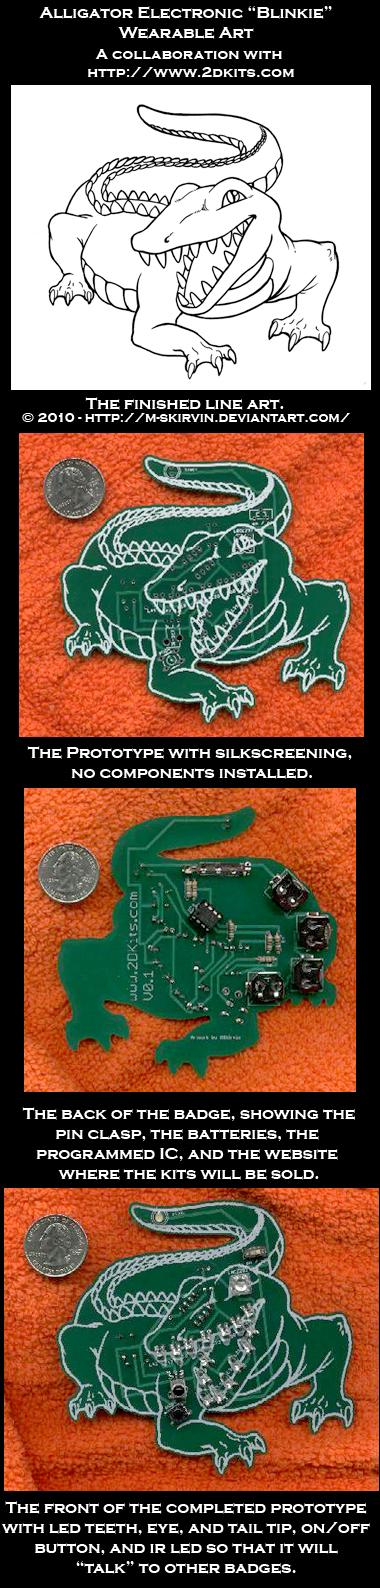 LED Alligator Wearable Circuit